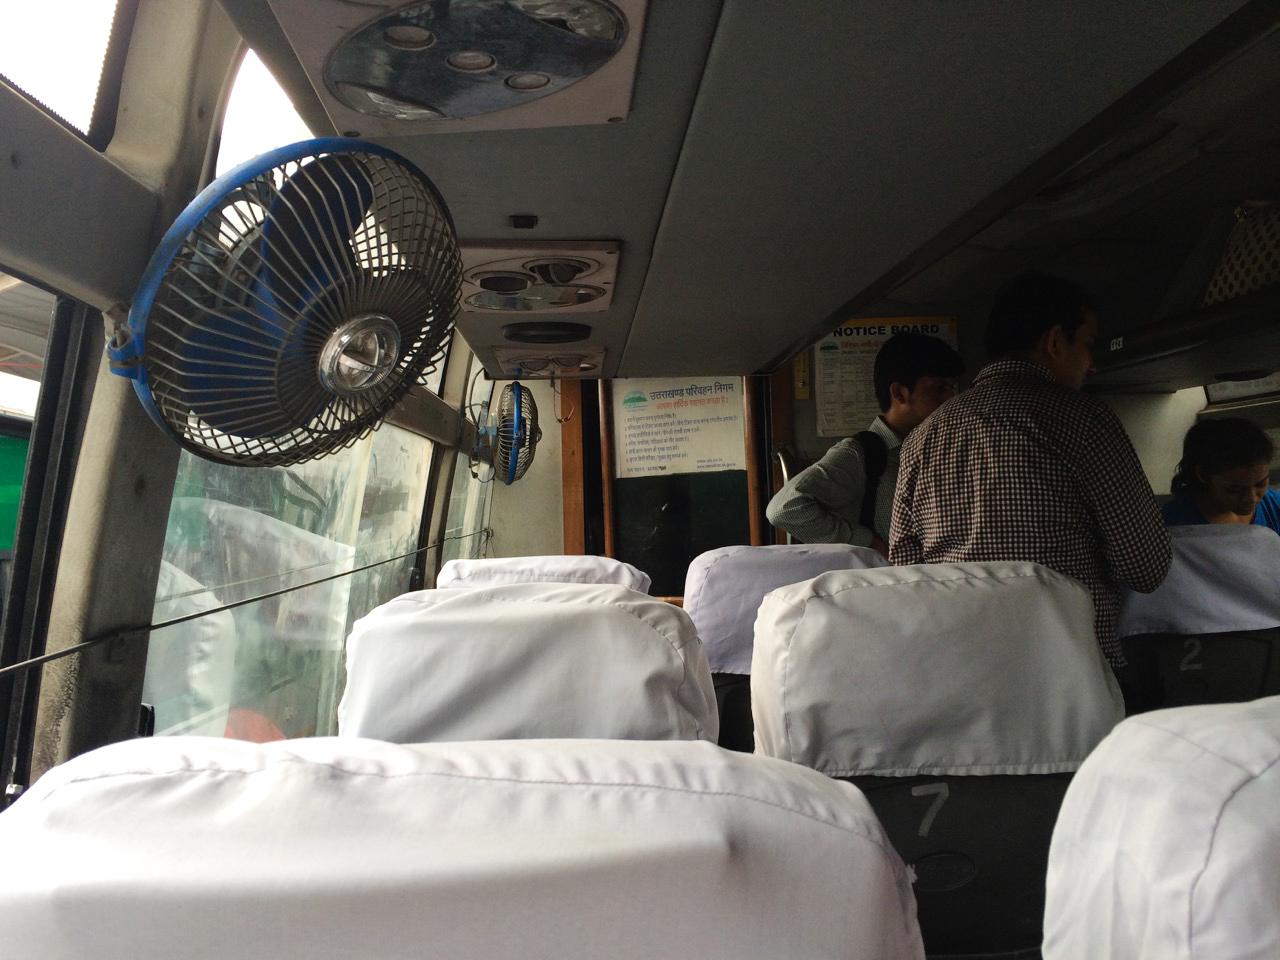 Путешествие по Индии: Автобус класса DELUX